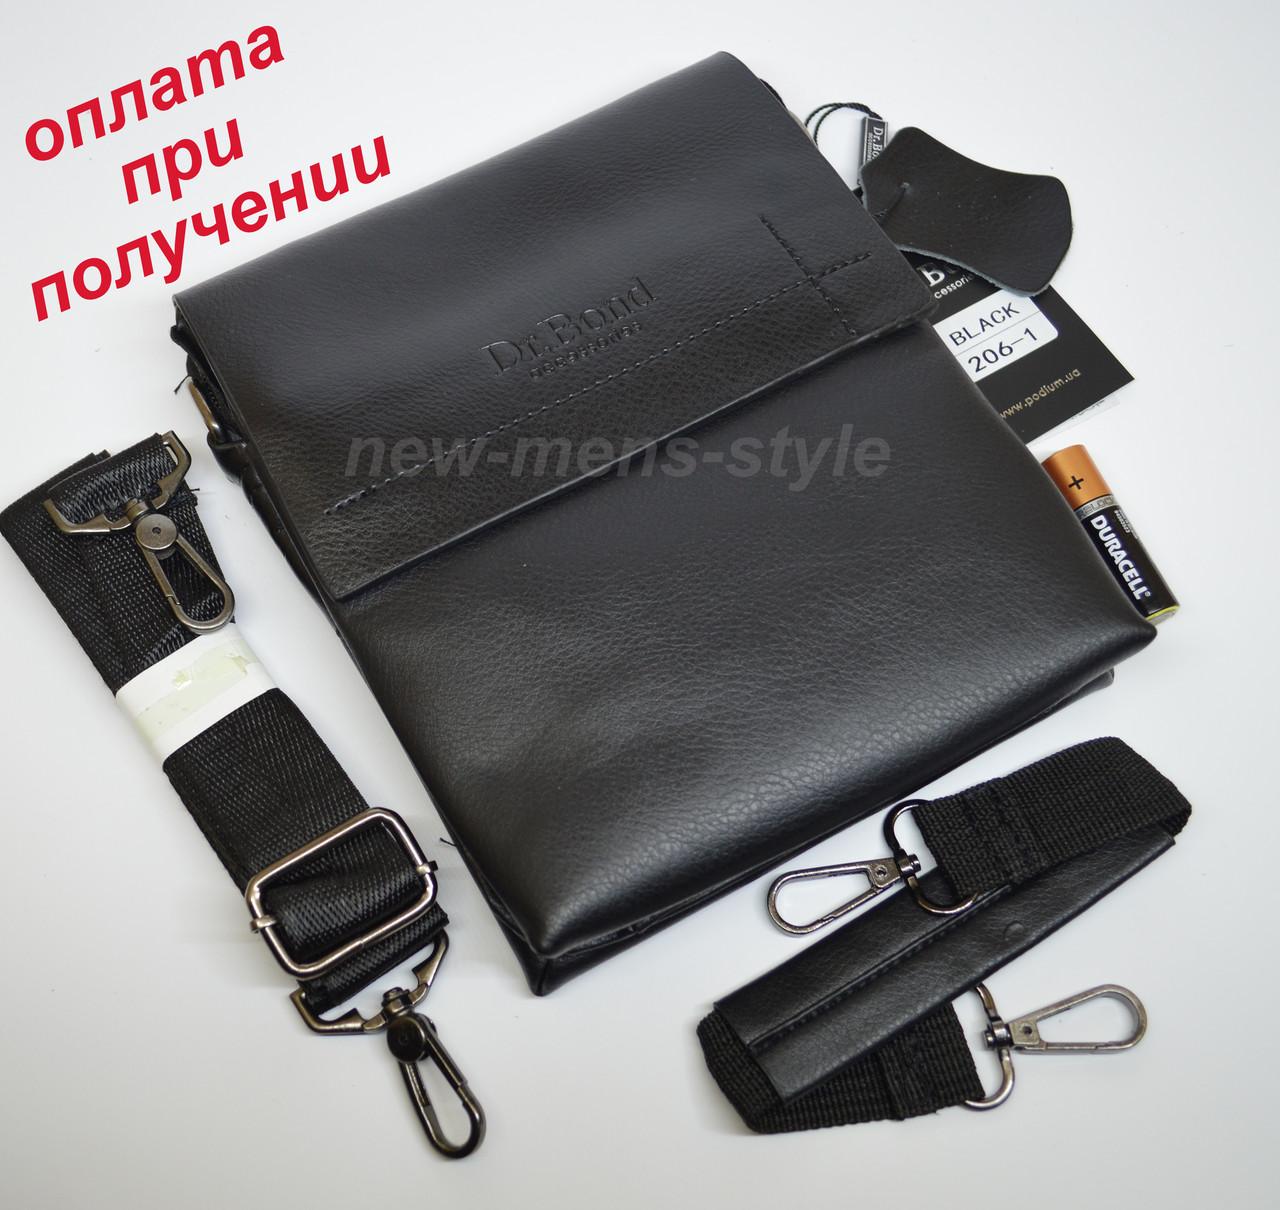 27c1bb66c4e9 Мужская чоловіча кожаная натуральная сумка барсетка на плечо Dr. BOND2